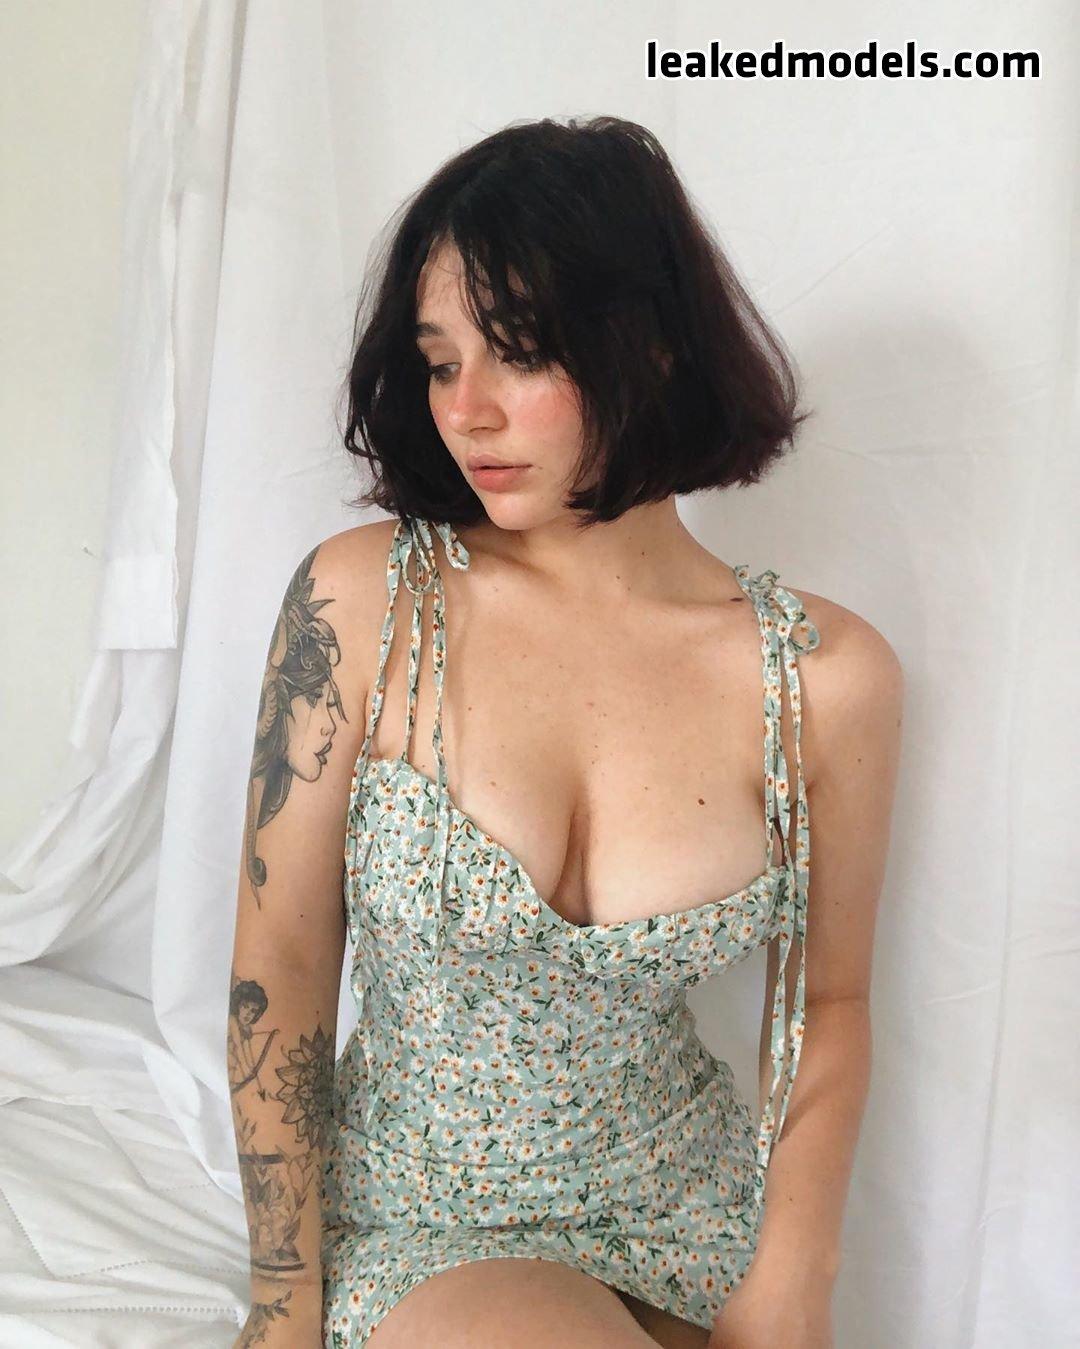 Mia Alves – Alvesm Onlyfans Leaks (43 photos + 5 videos)